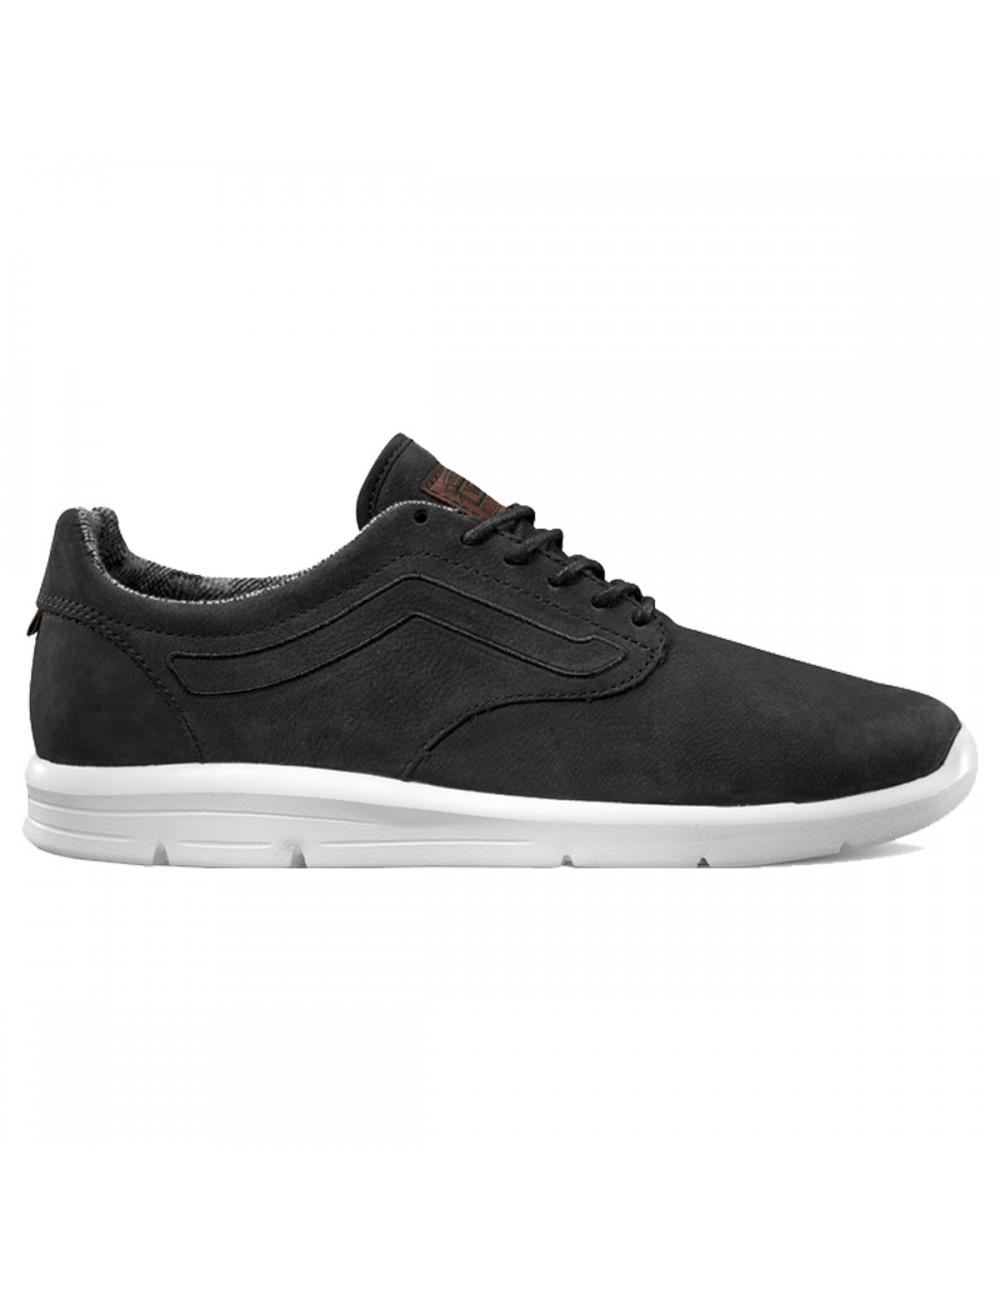 Vans ISO 1.5 Shoes - Black_11437